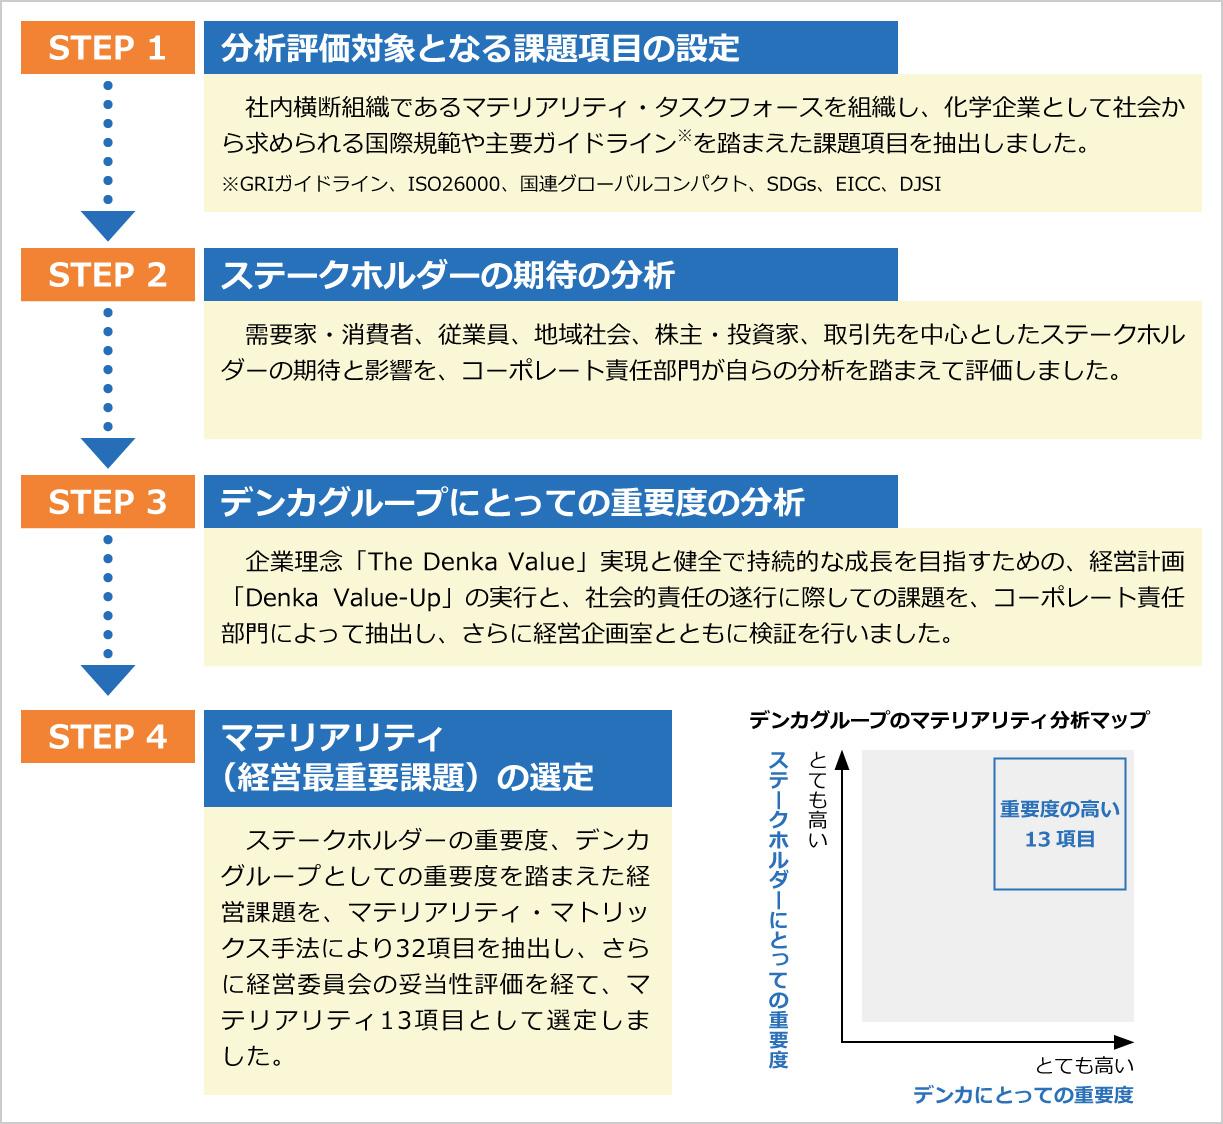 CSR最重要課題(マテリアリティ)選定プロセス